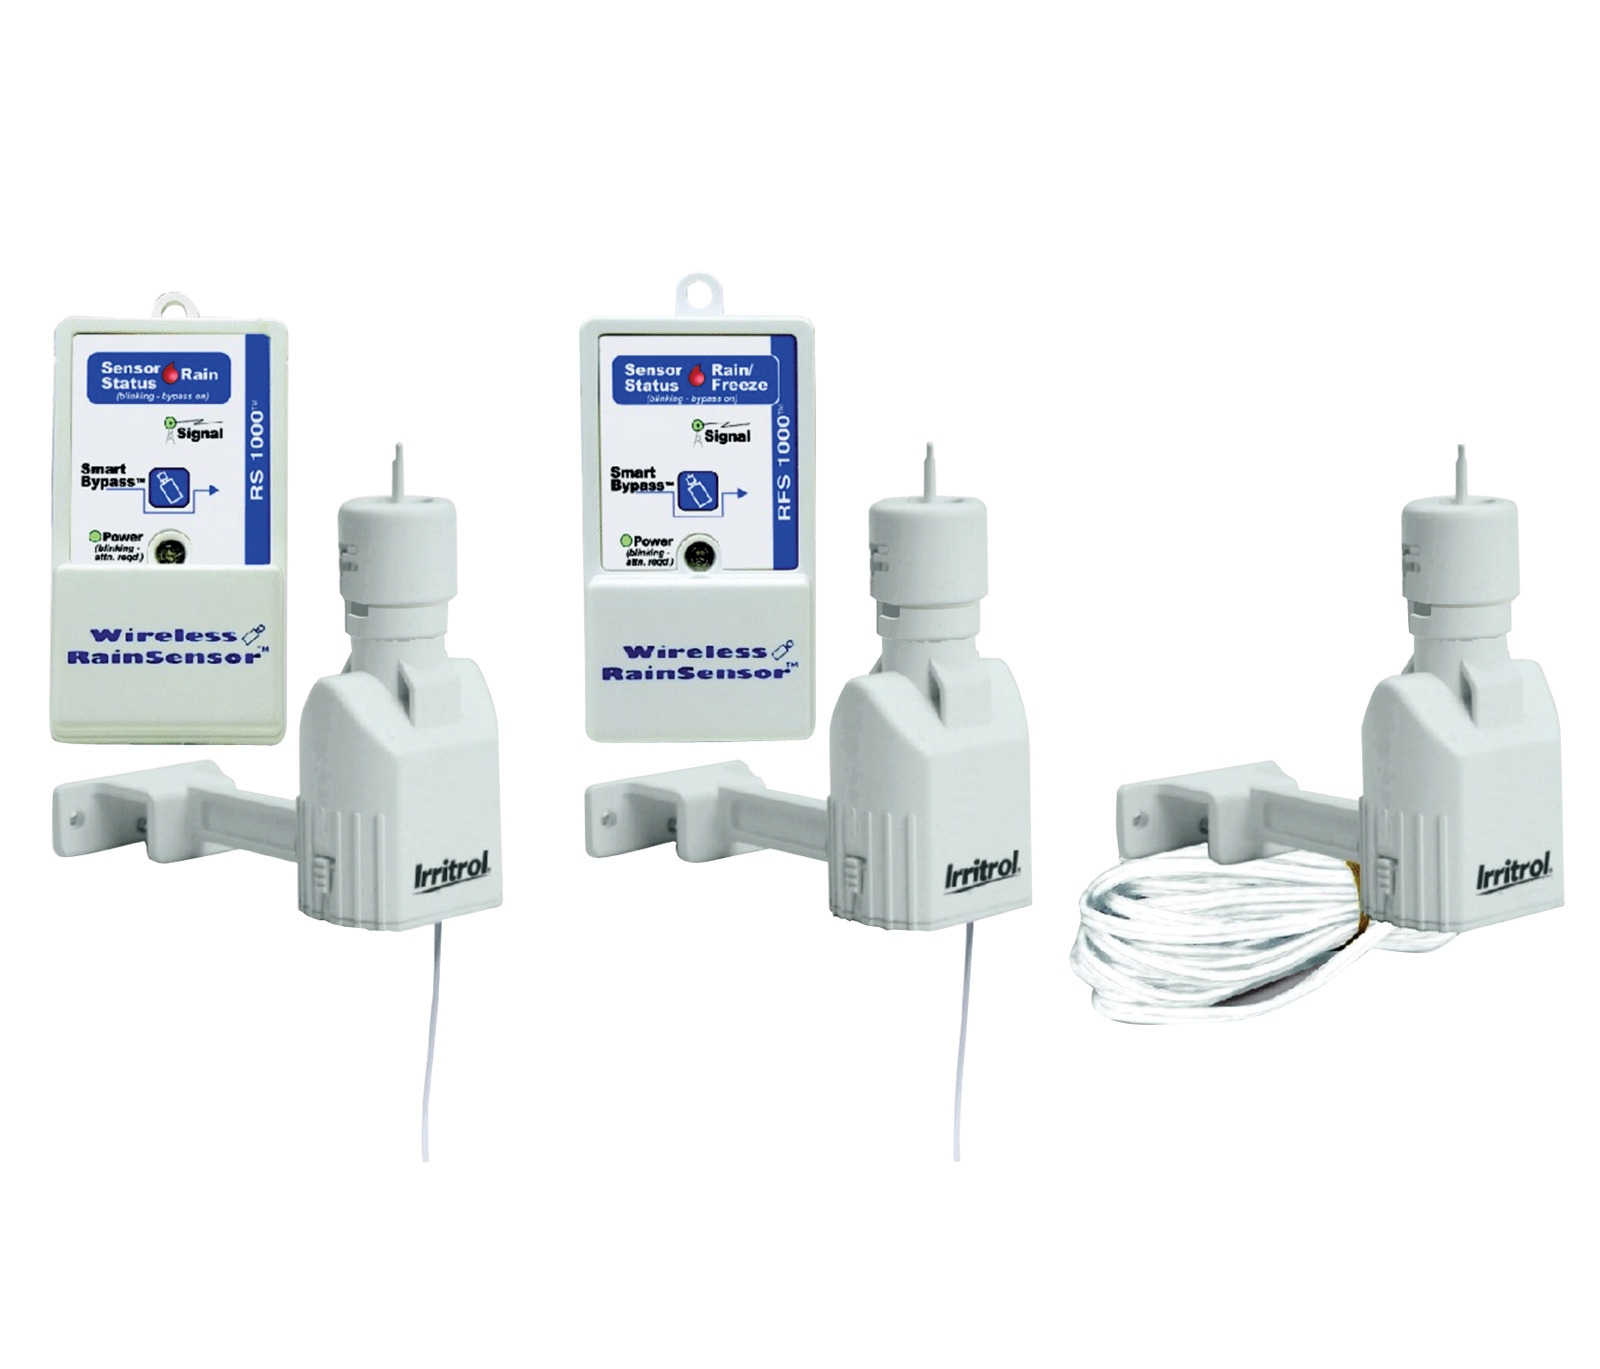 rainsensors_studio.ashx?mw=700&mh=599&hash=D4F5FC047A821D8CAF5C9690C7B88AE1314B52DE irritrol rainsensor series Basic Electrical Wiring Diagrams at reclaimingppi.co